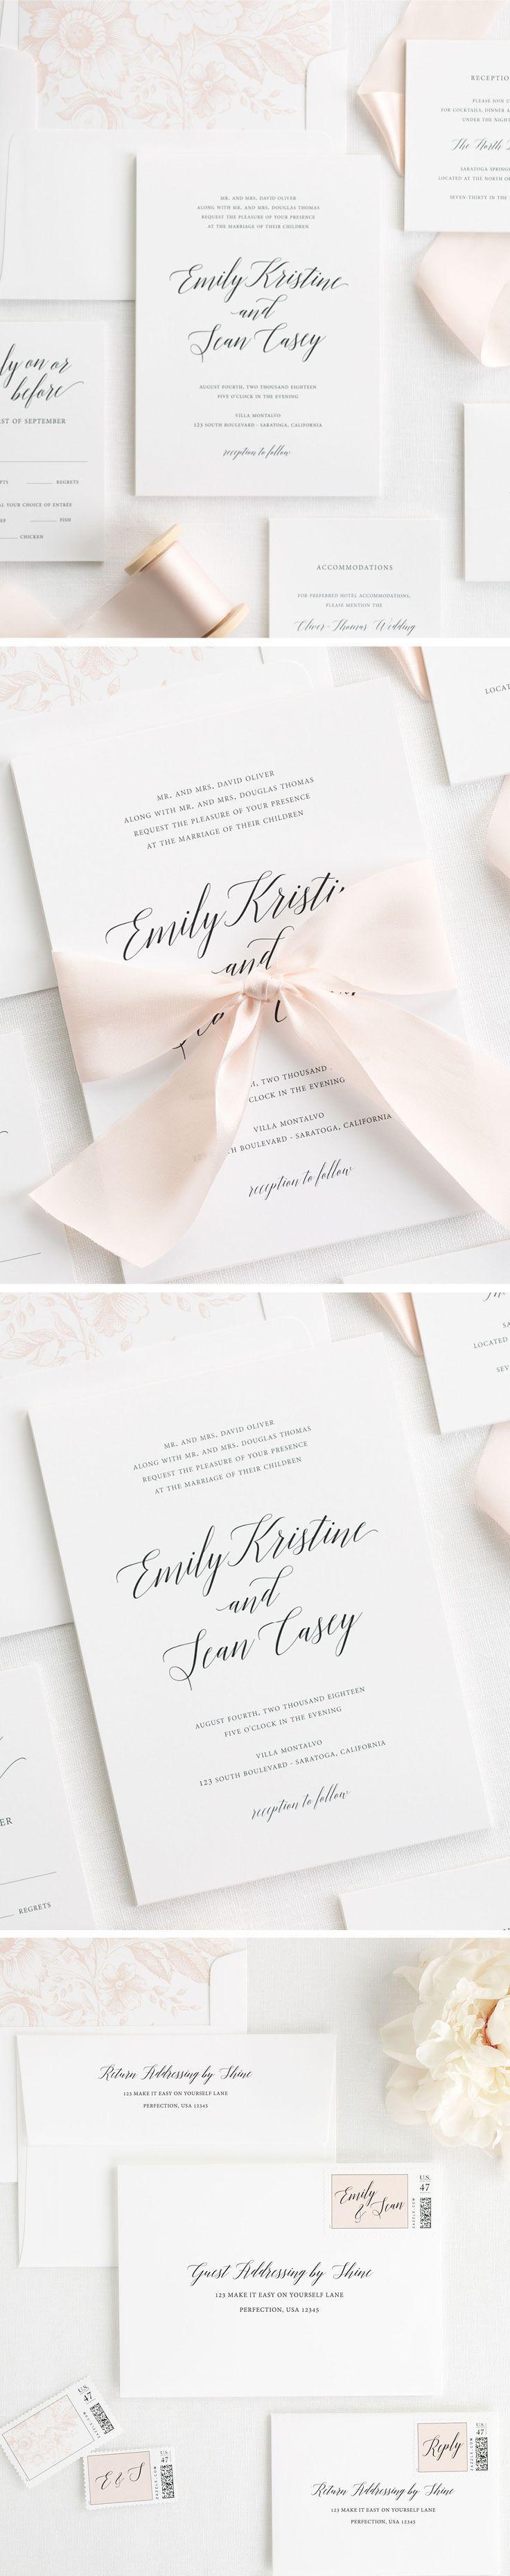 952 Best Shine Wedding Invitations Images On Pinterest Destination